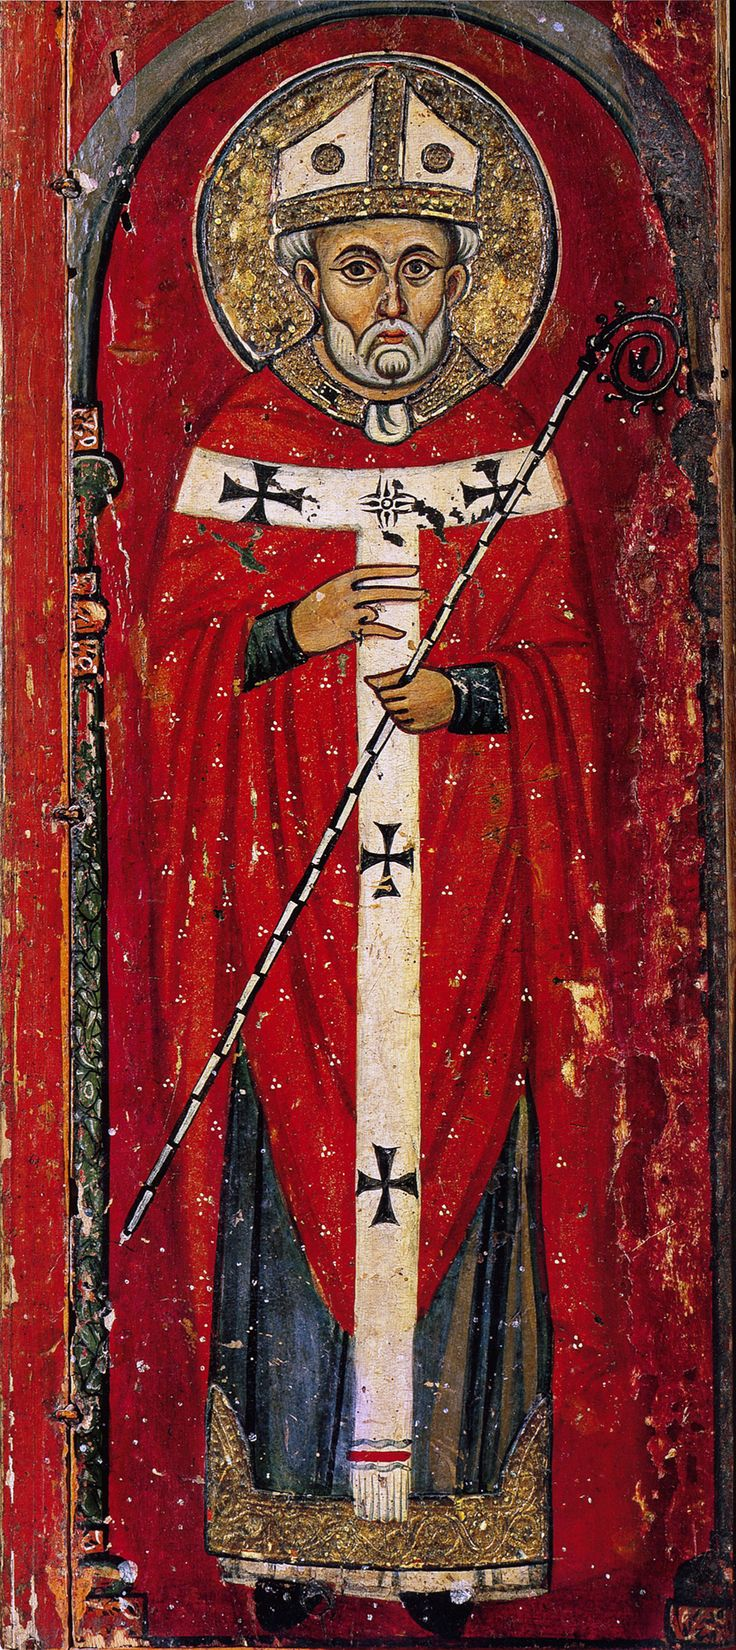 свт. Николай Чудотворец Мирликийский,  (триптих); XIII